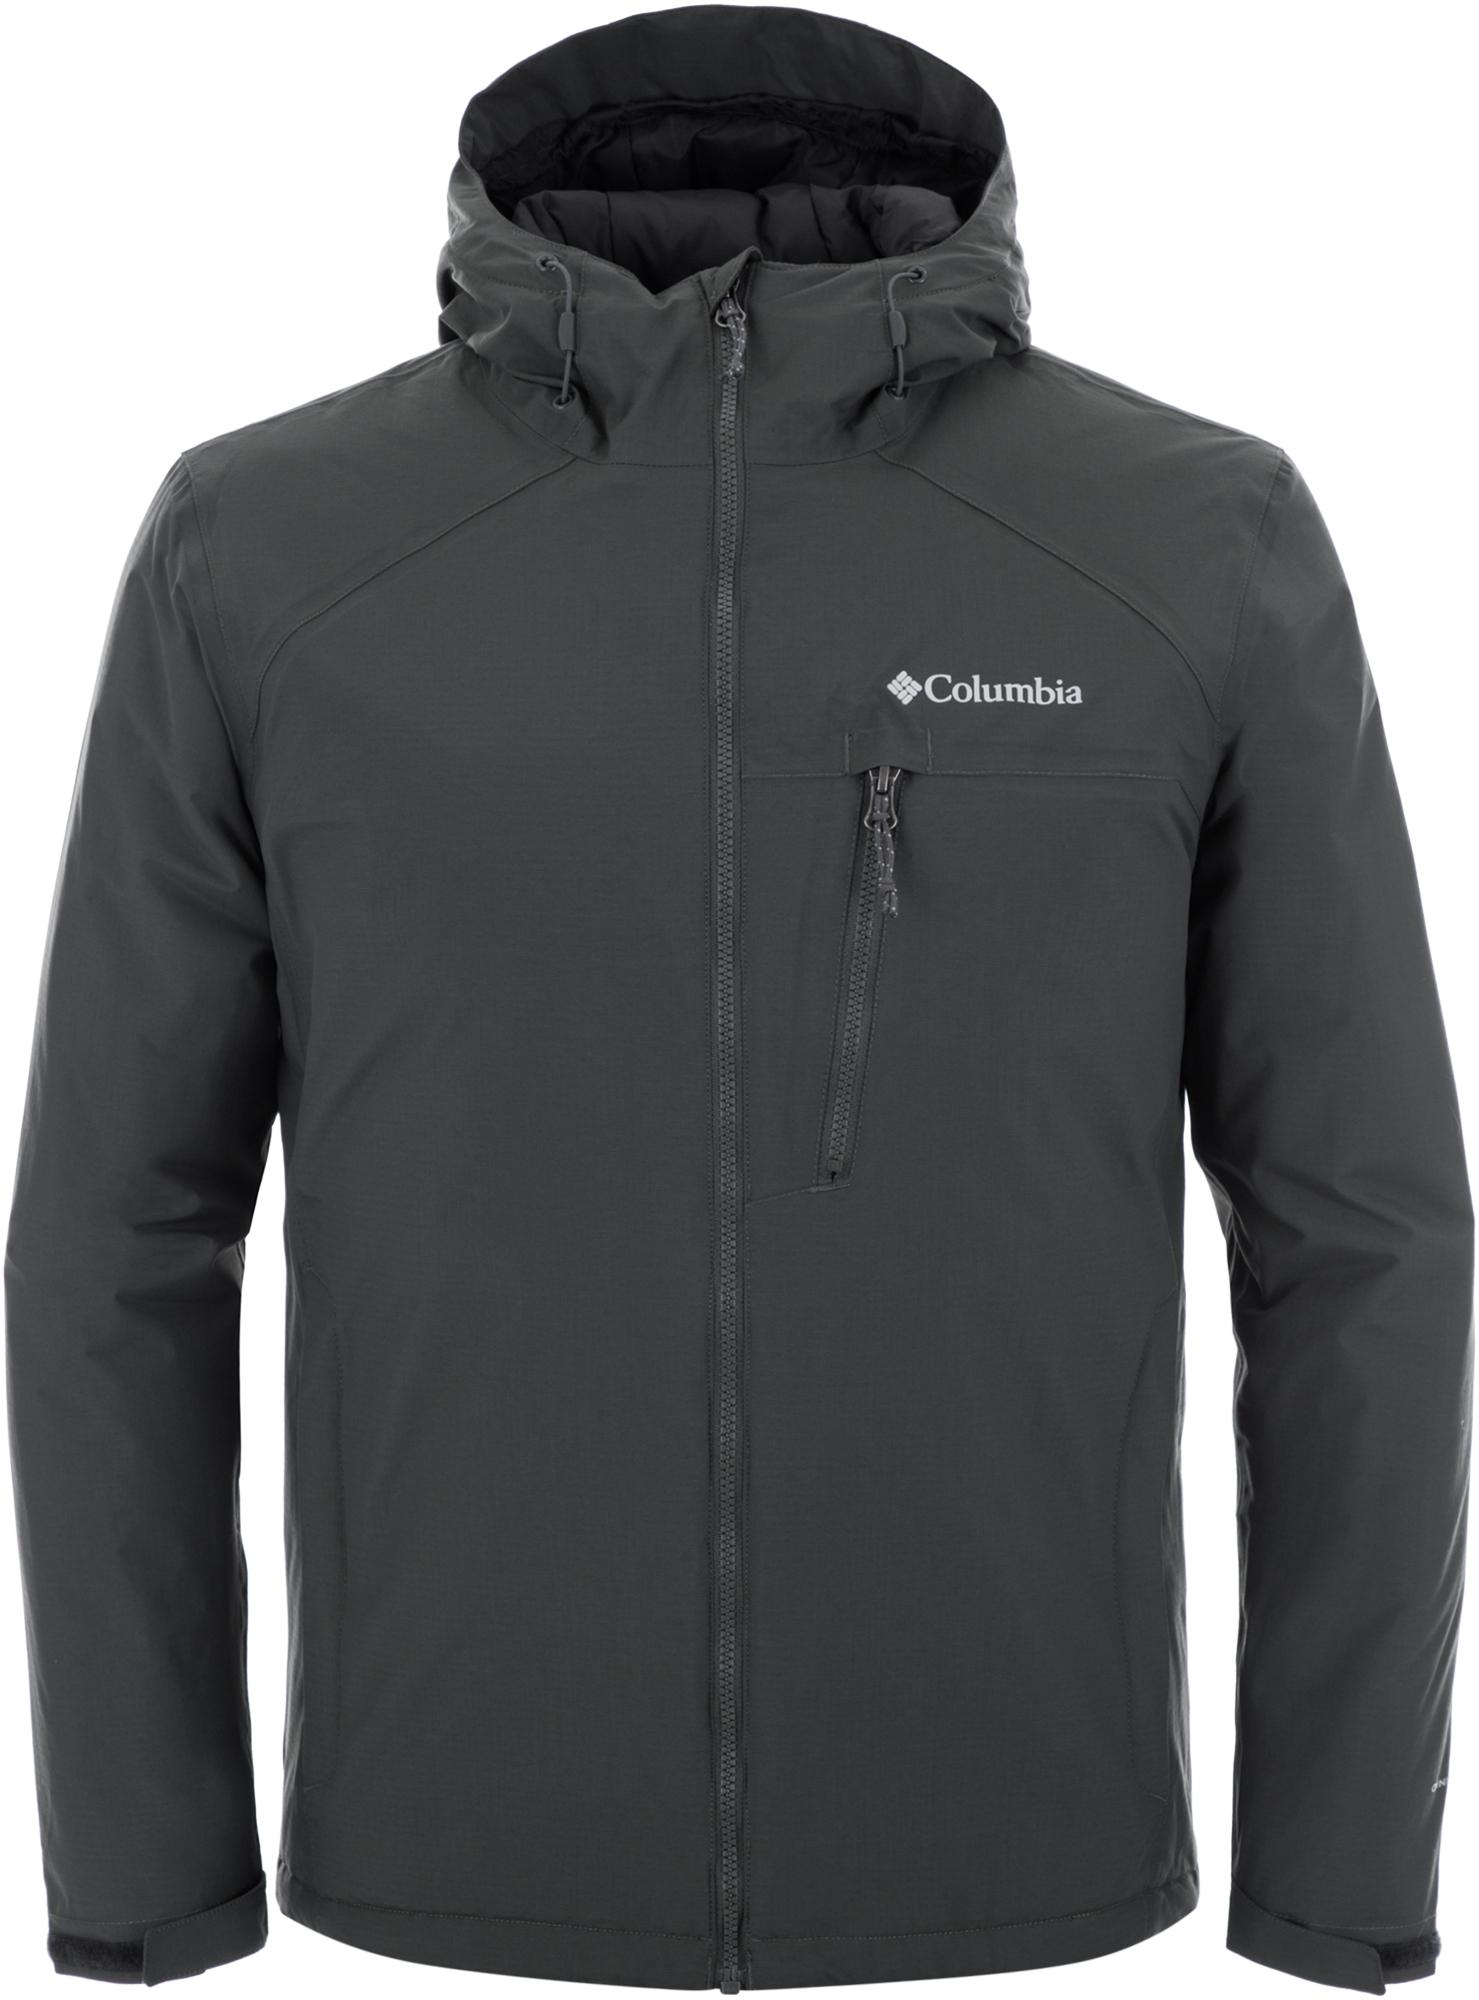 Columbia Куртка утепленная мужская Columbia Western Barlow Insulated, размер 56-58 цена